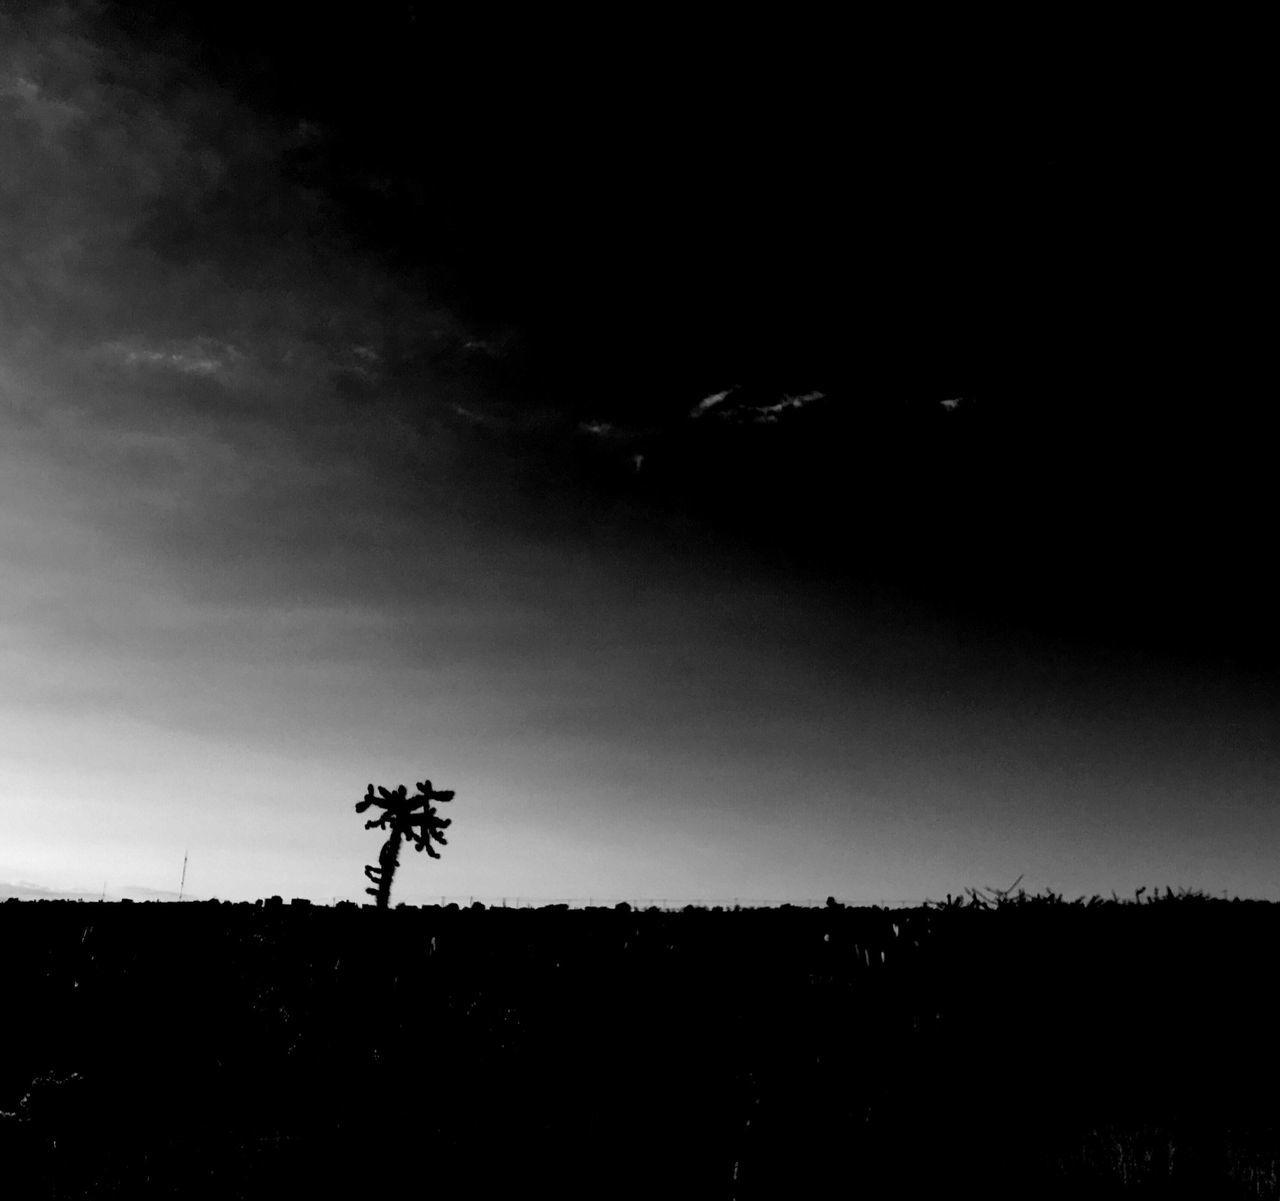 Despedida Silhouette Nature Beauty In Nature EyeEm Best Shots EyeEm Best Shots - Black + White